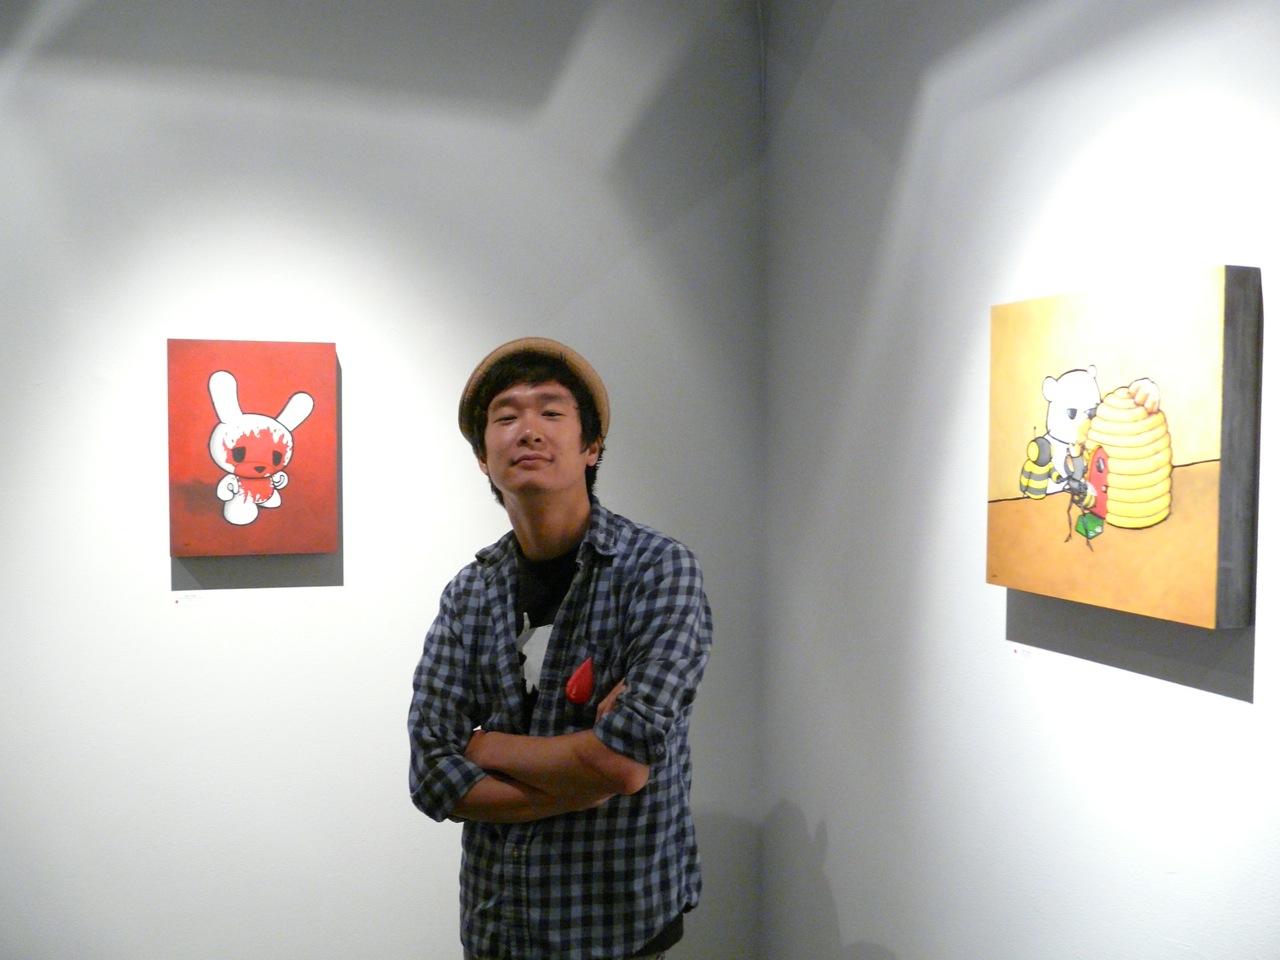 Yoskay Yamamoto